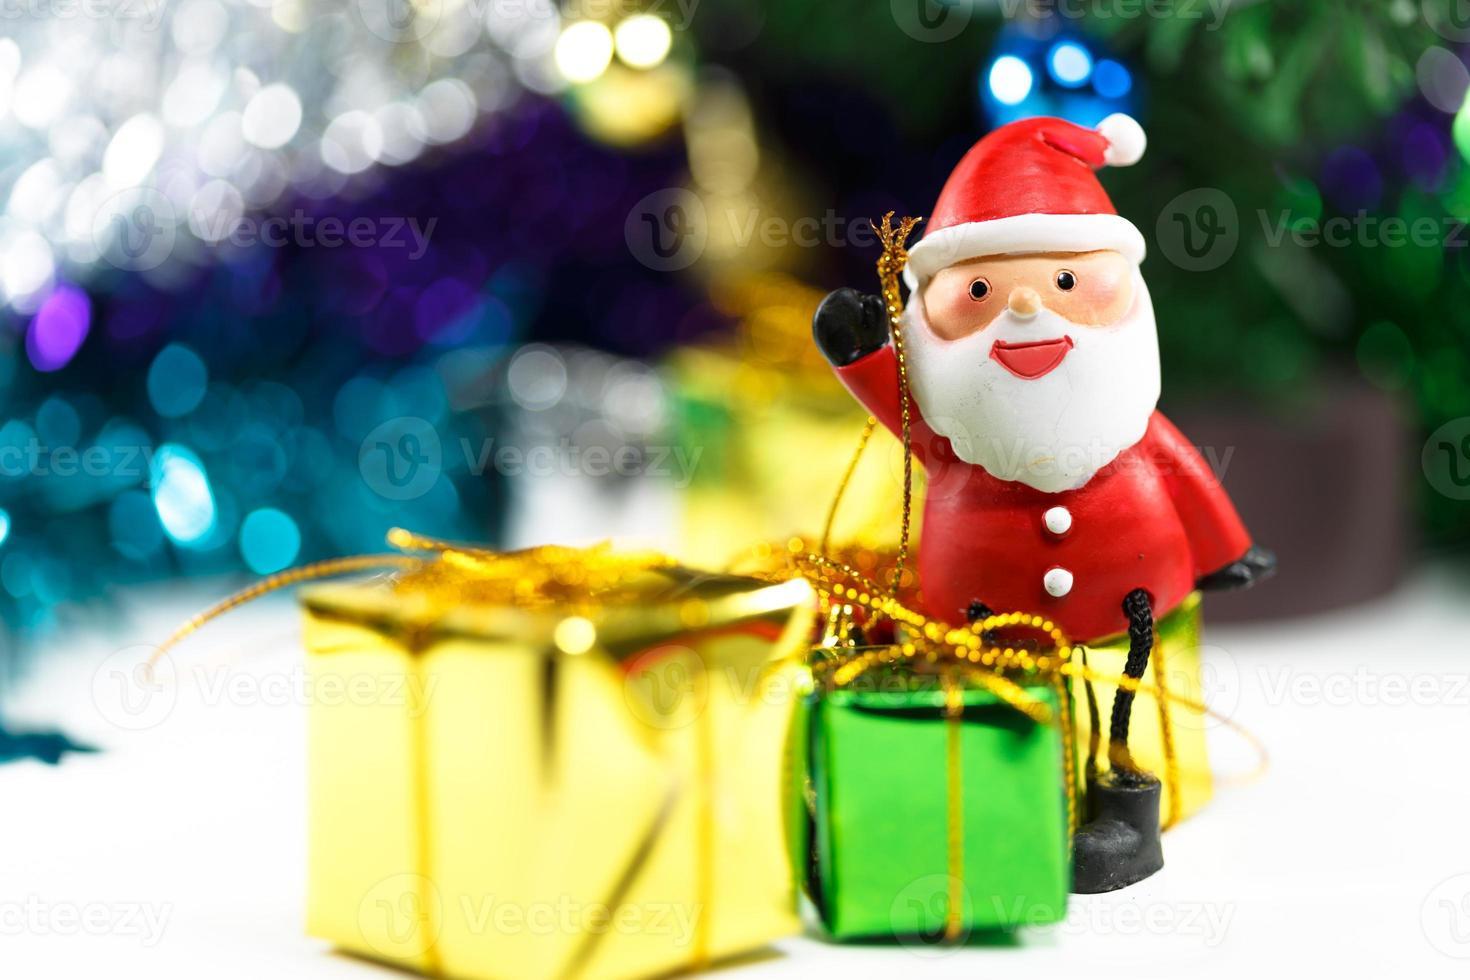 festa de natal do papai noel com caixa de presente foto